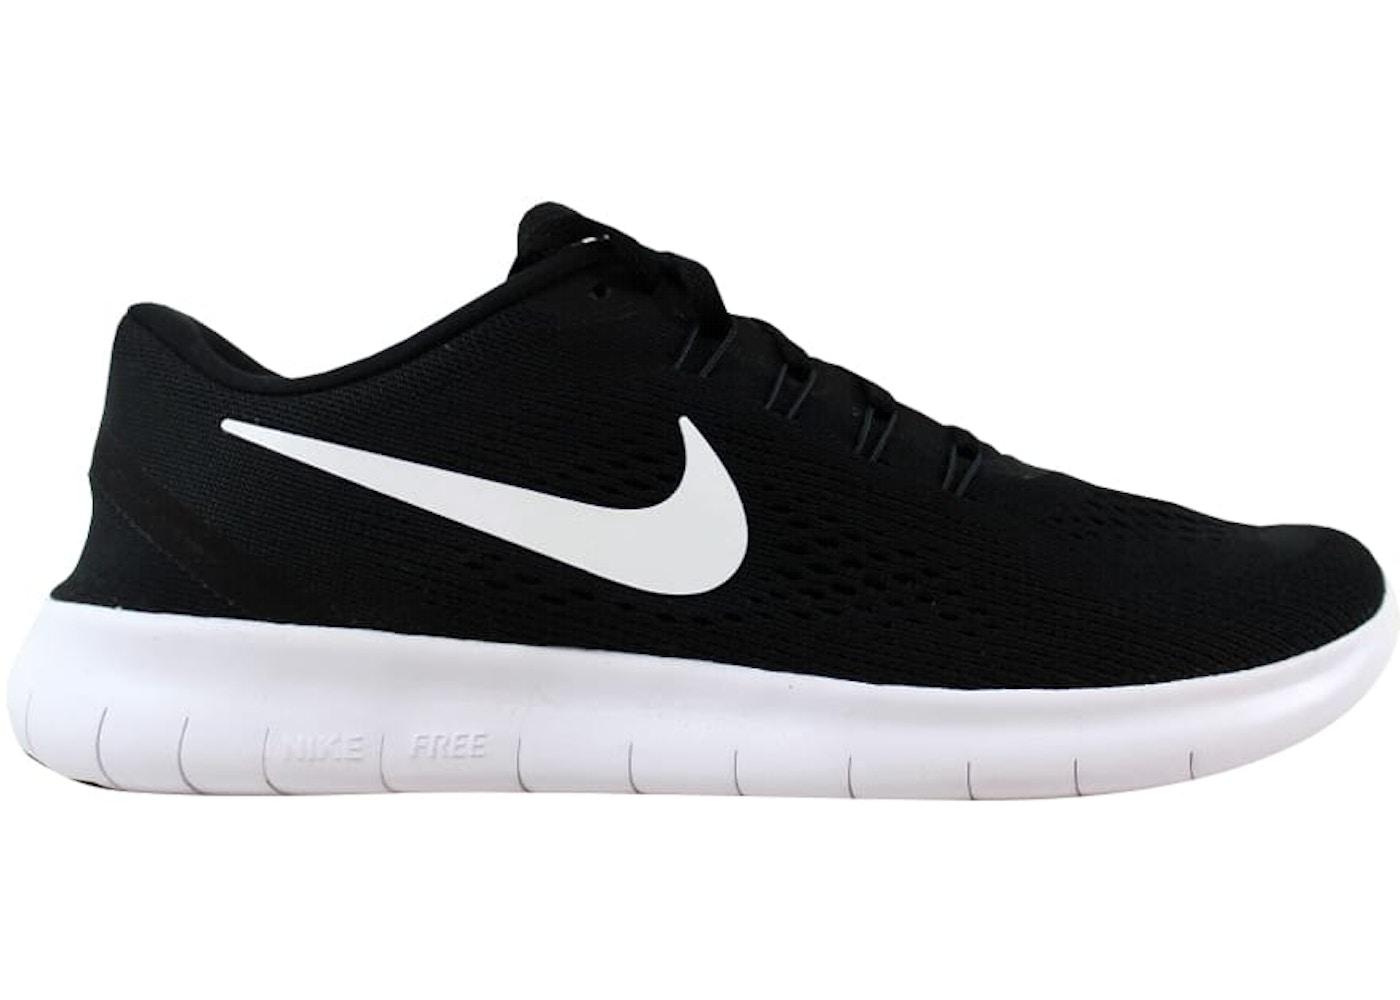 Nike Free RN Black White-Anthracite - 831508-001 39904b9fa387